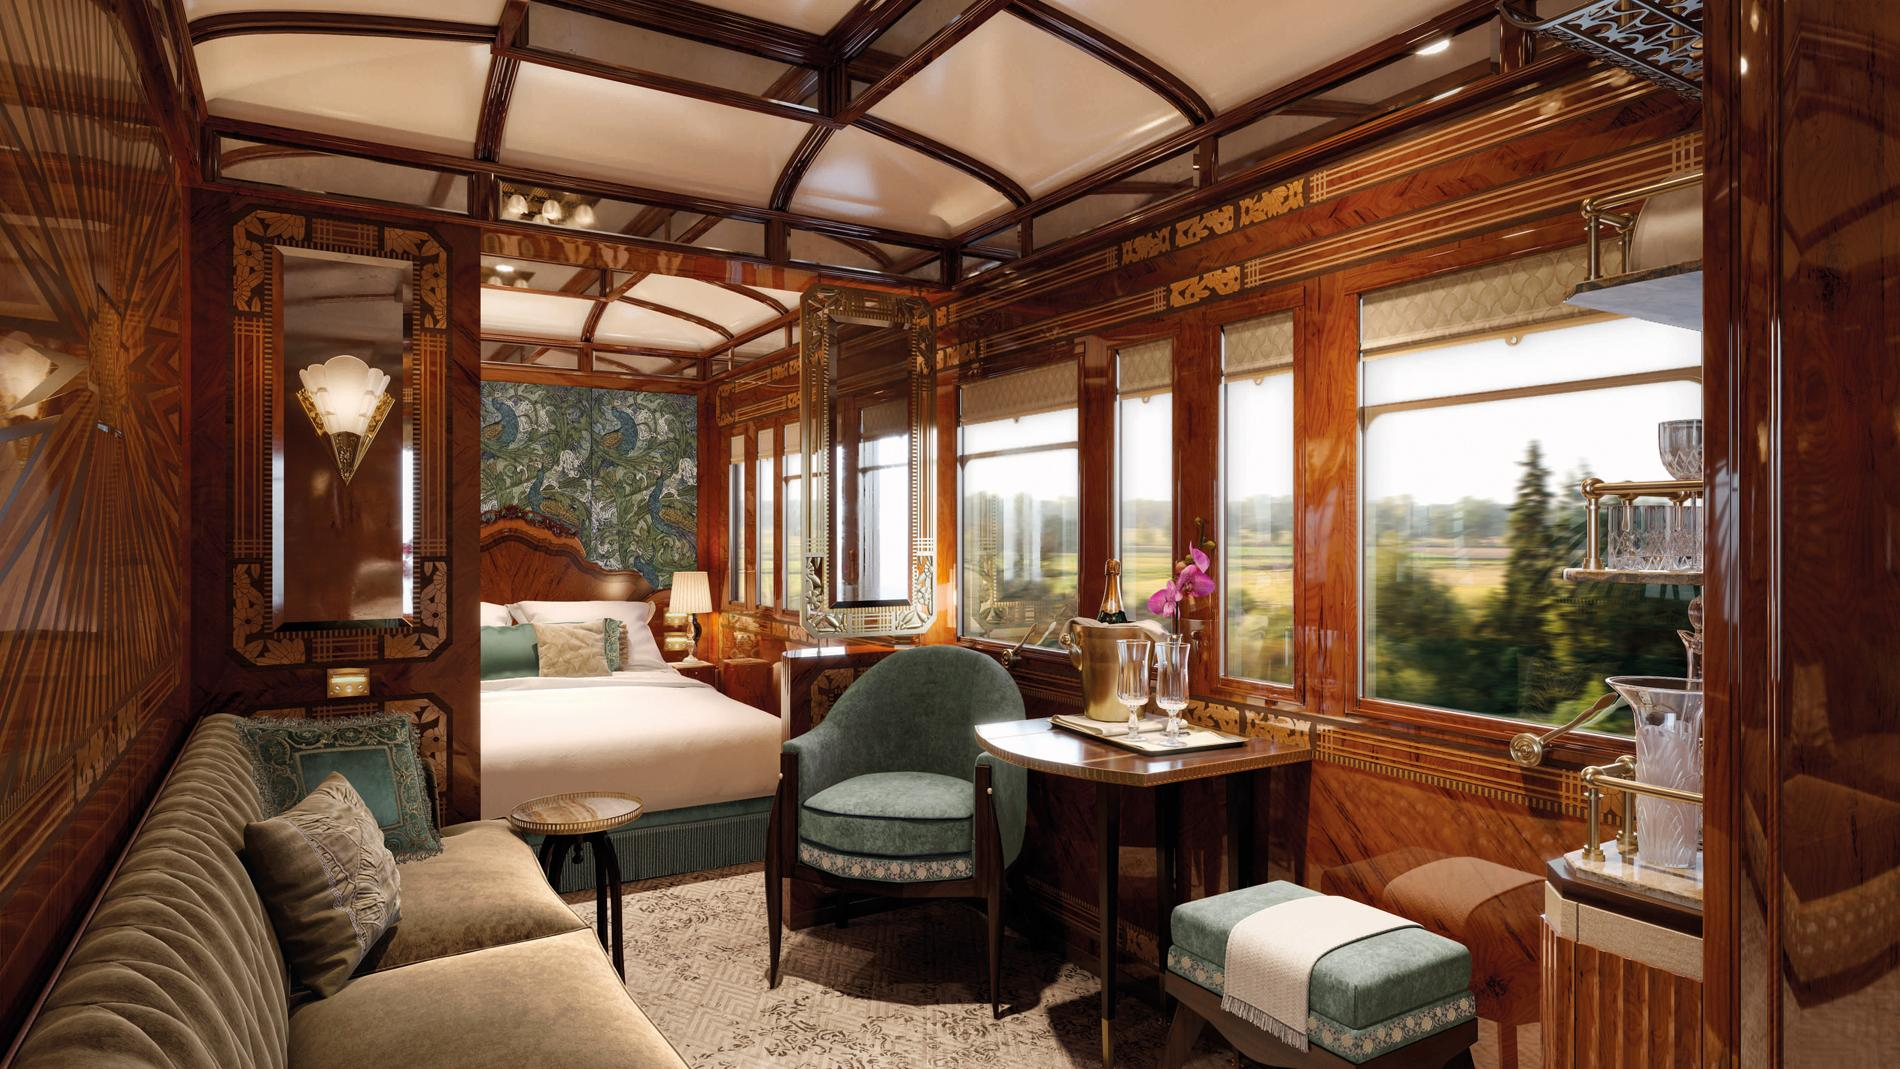 La luxueuse métamorphose du Venise Simplon-Orient-Express - Madame Figaro